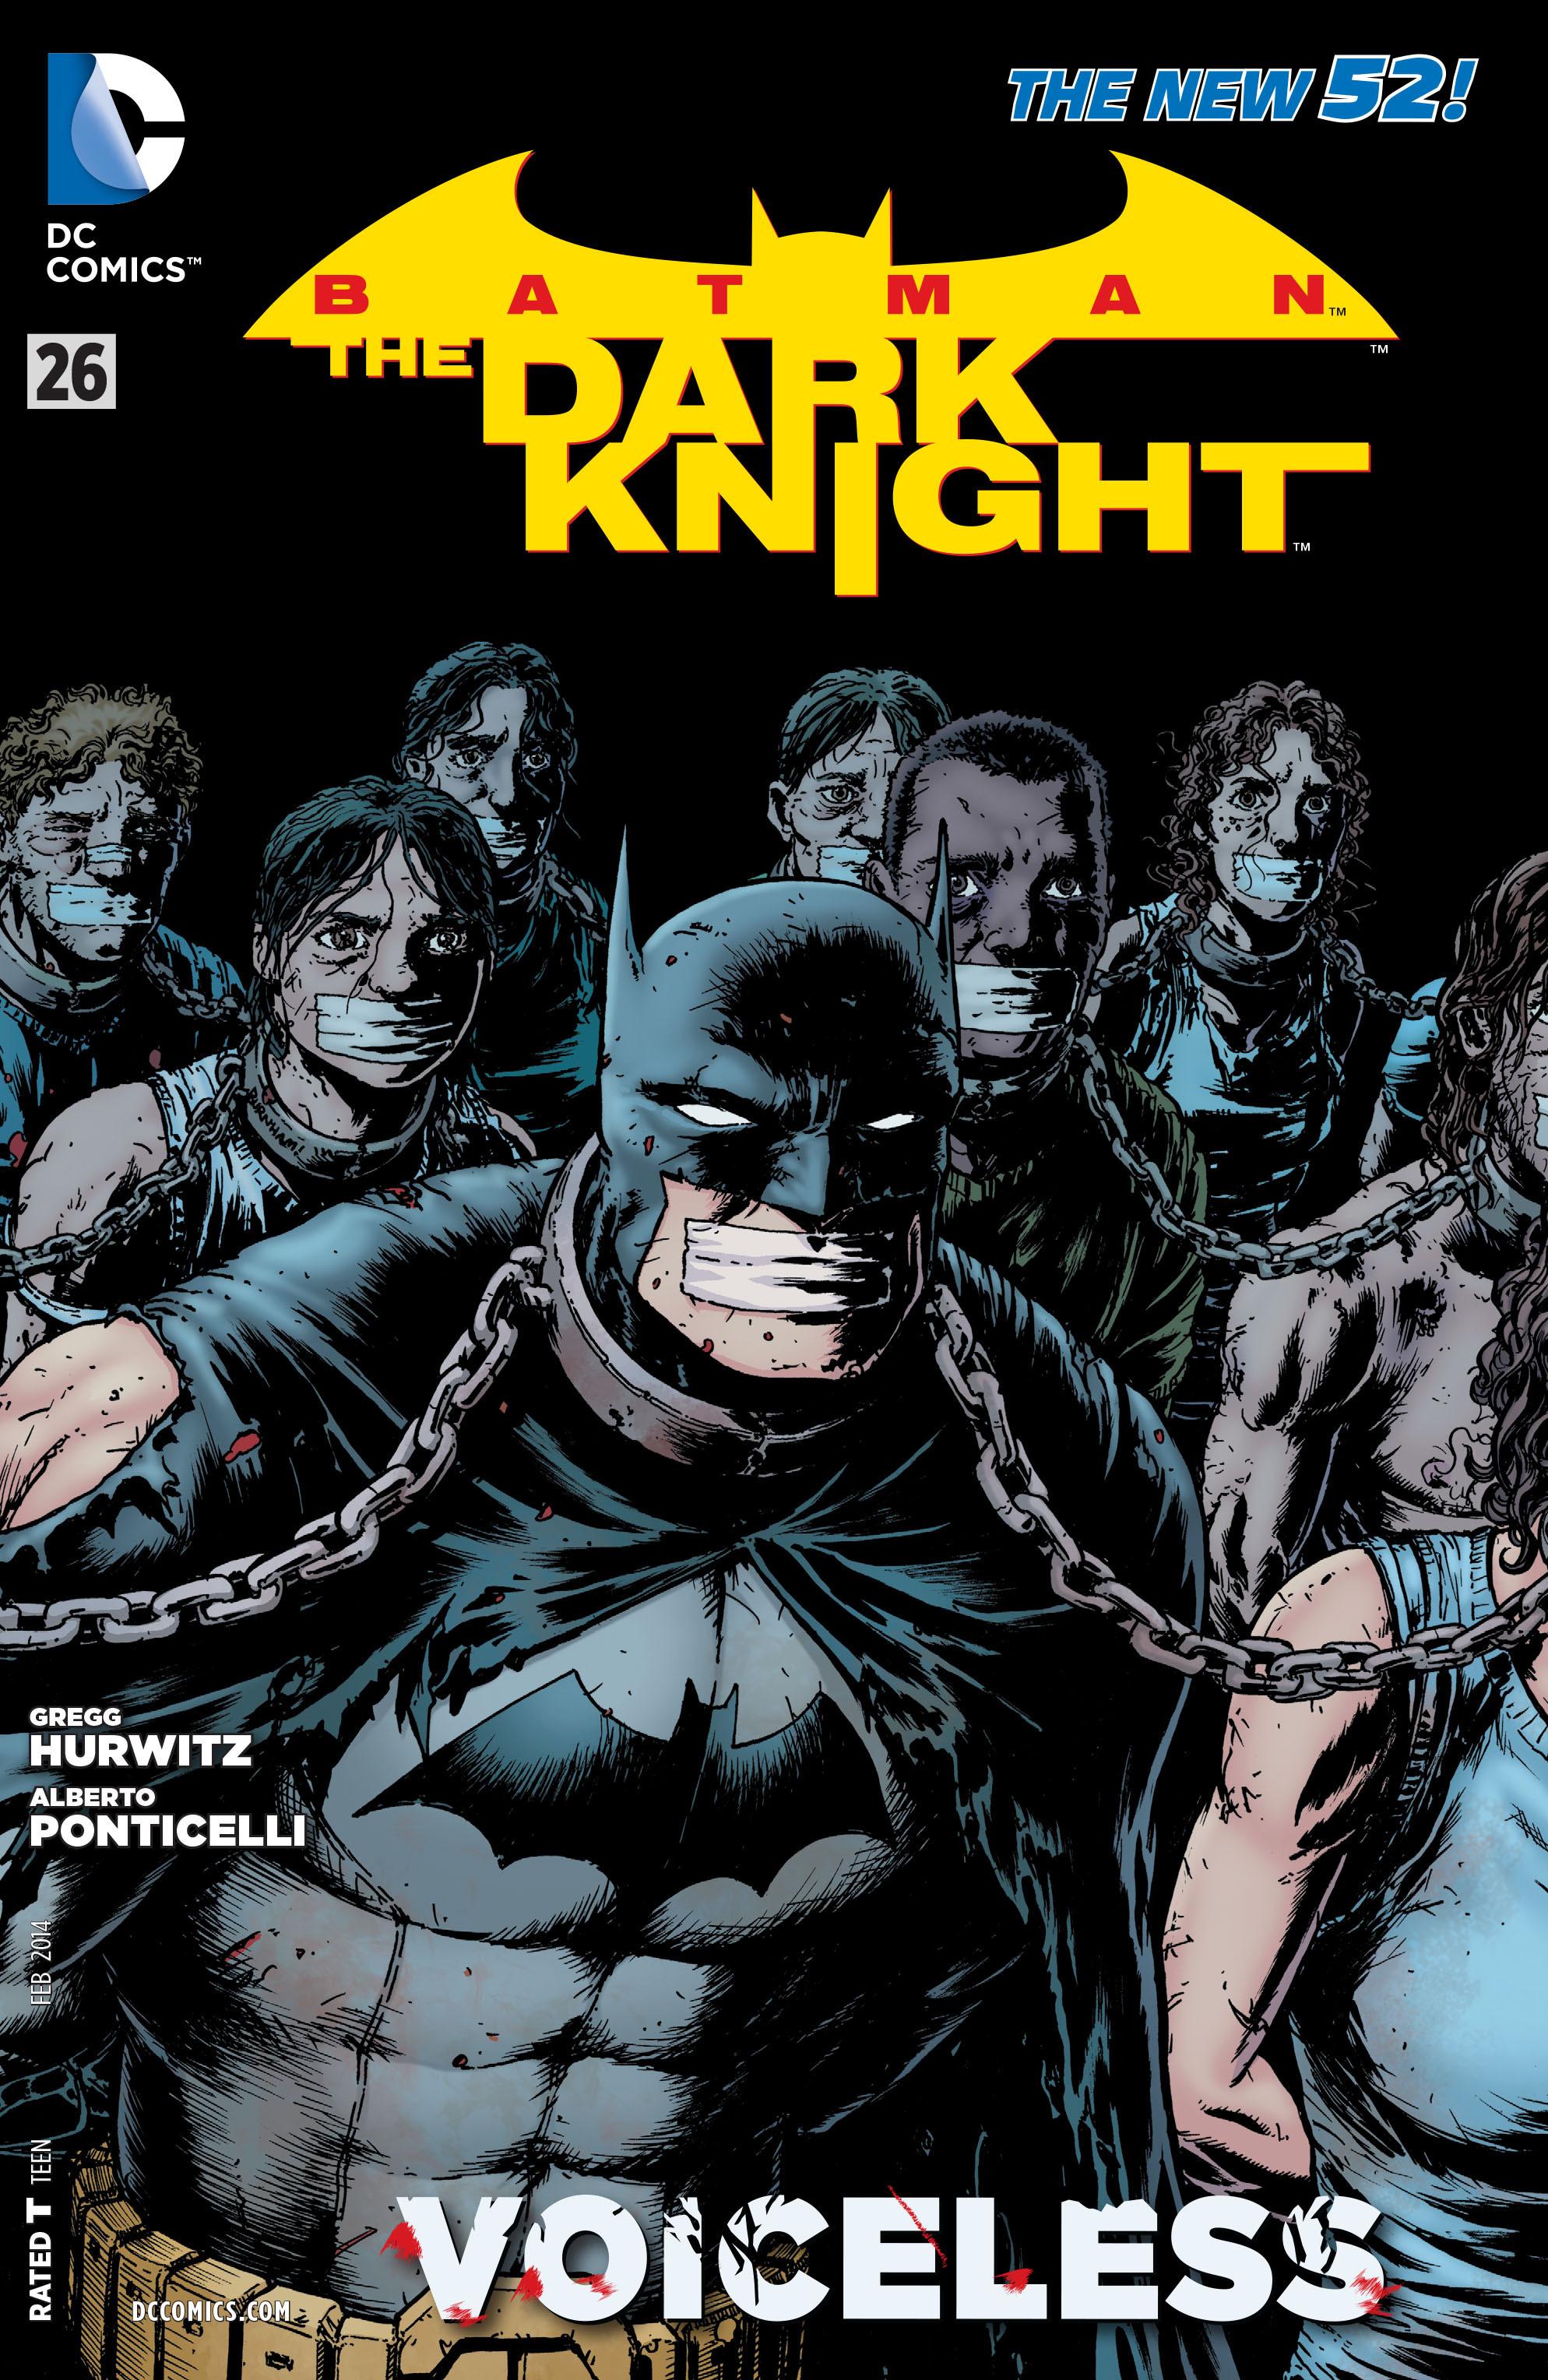 Making christmas ornaments at home - Batman The Dark Knight Vol 2 26 Dc Comics Database